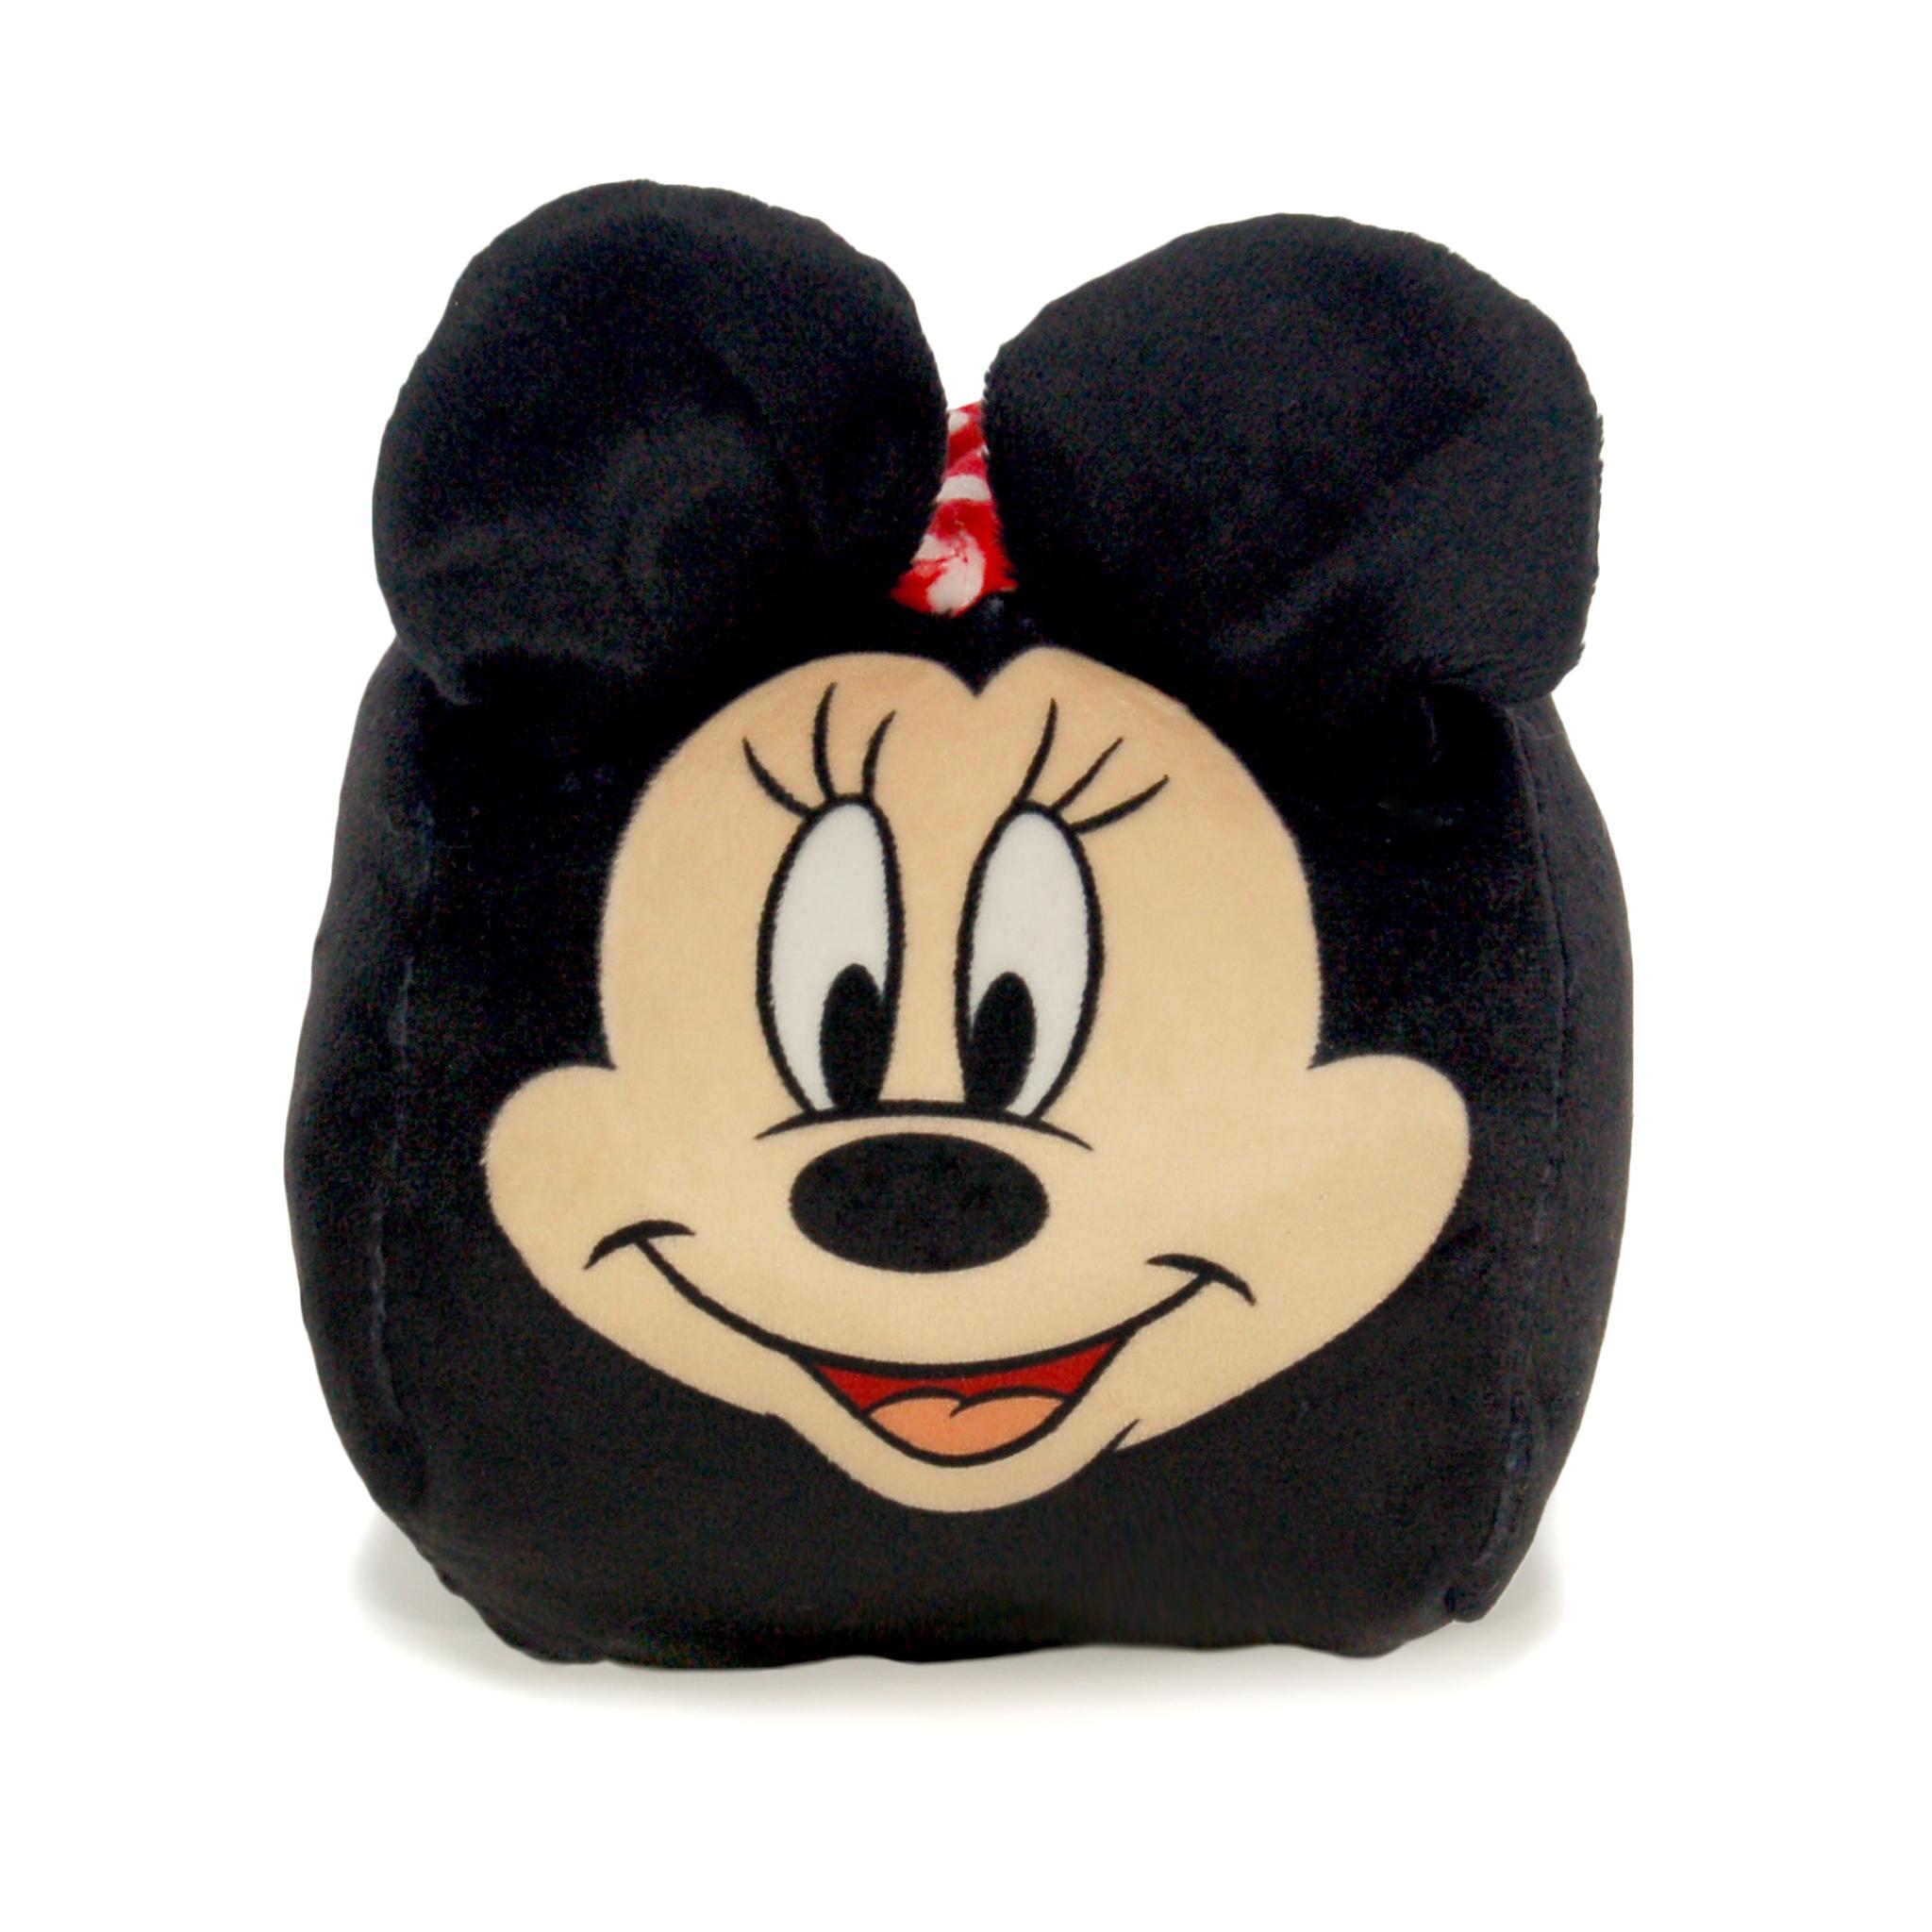 Disney's Minnie Mouse 3D Ultra Stretch Mini Cloud Cube Travel Pillow, 1 Each